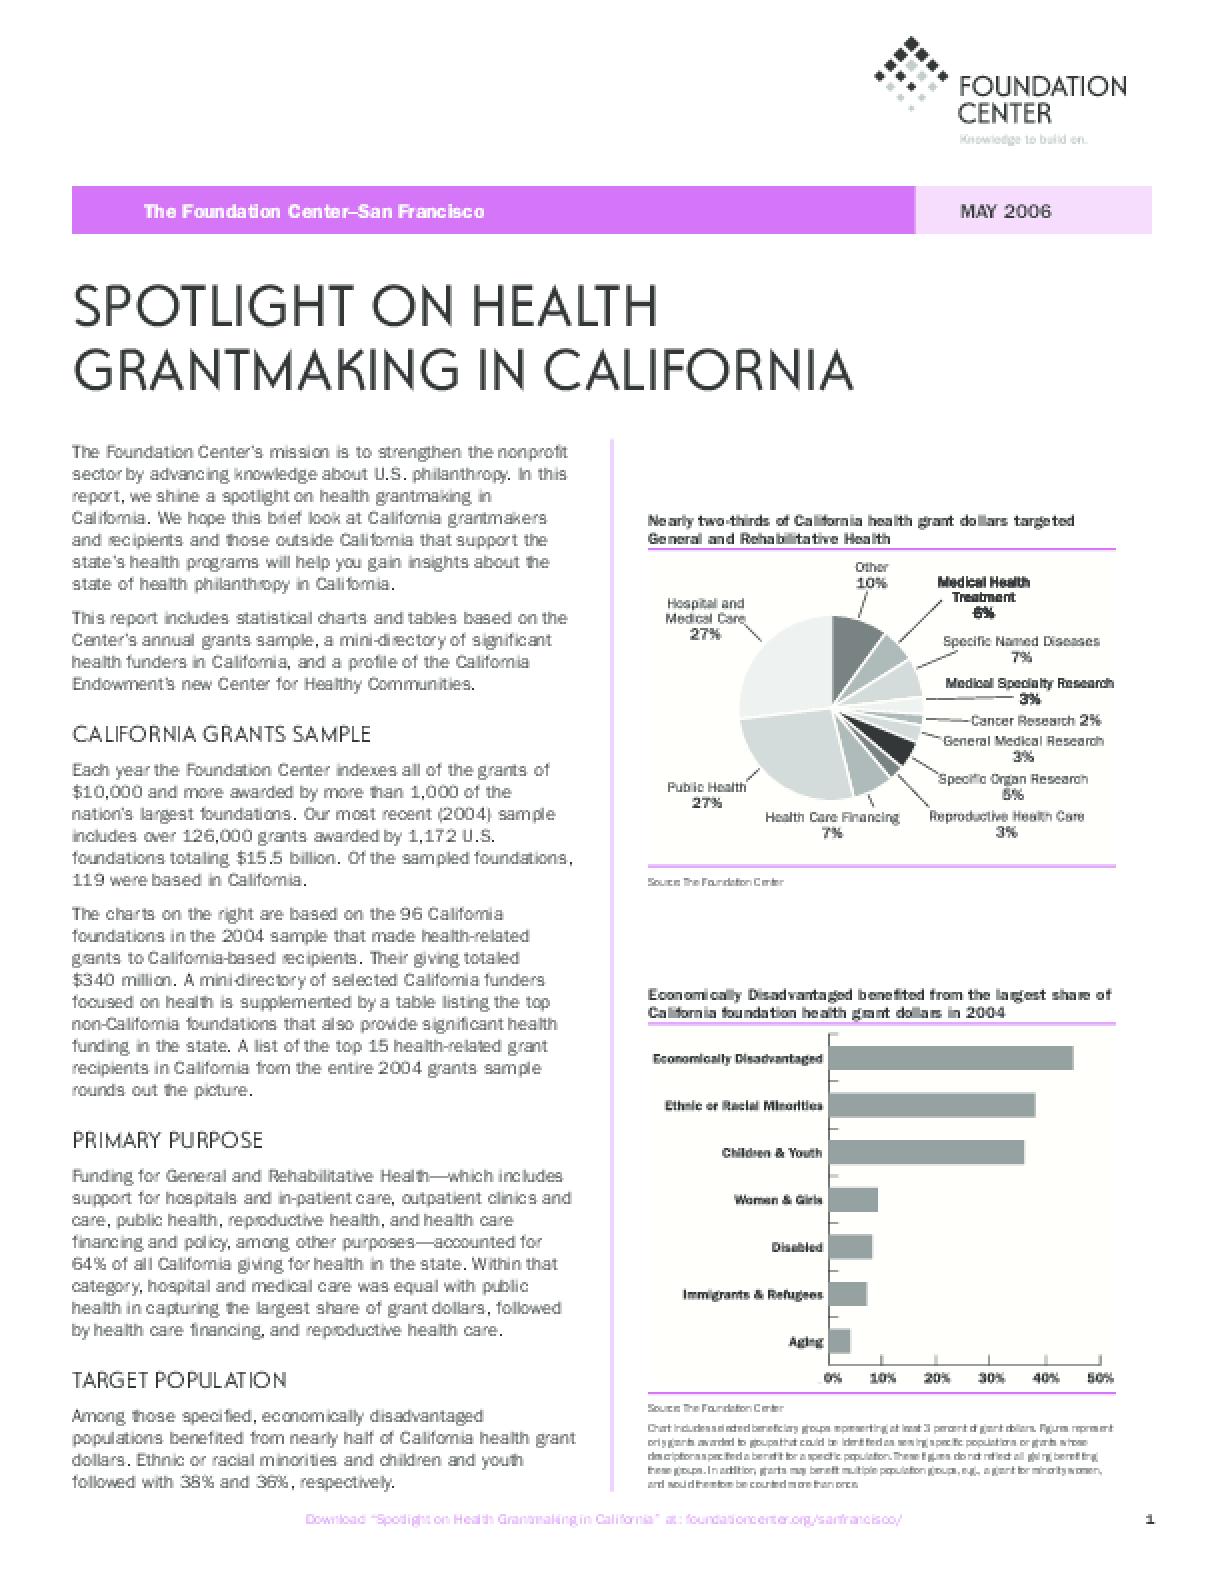 Spotlight on Health Grantmaking in California